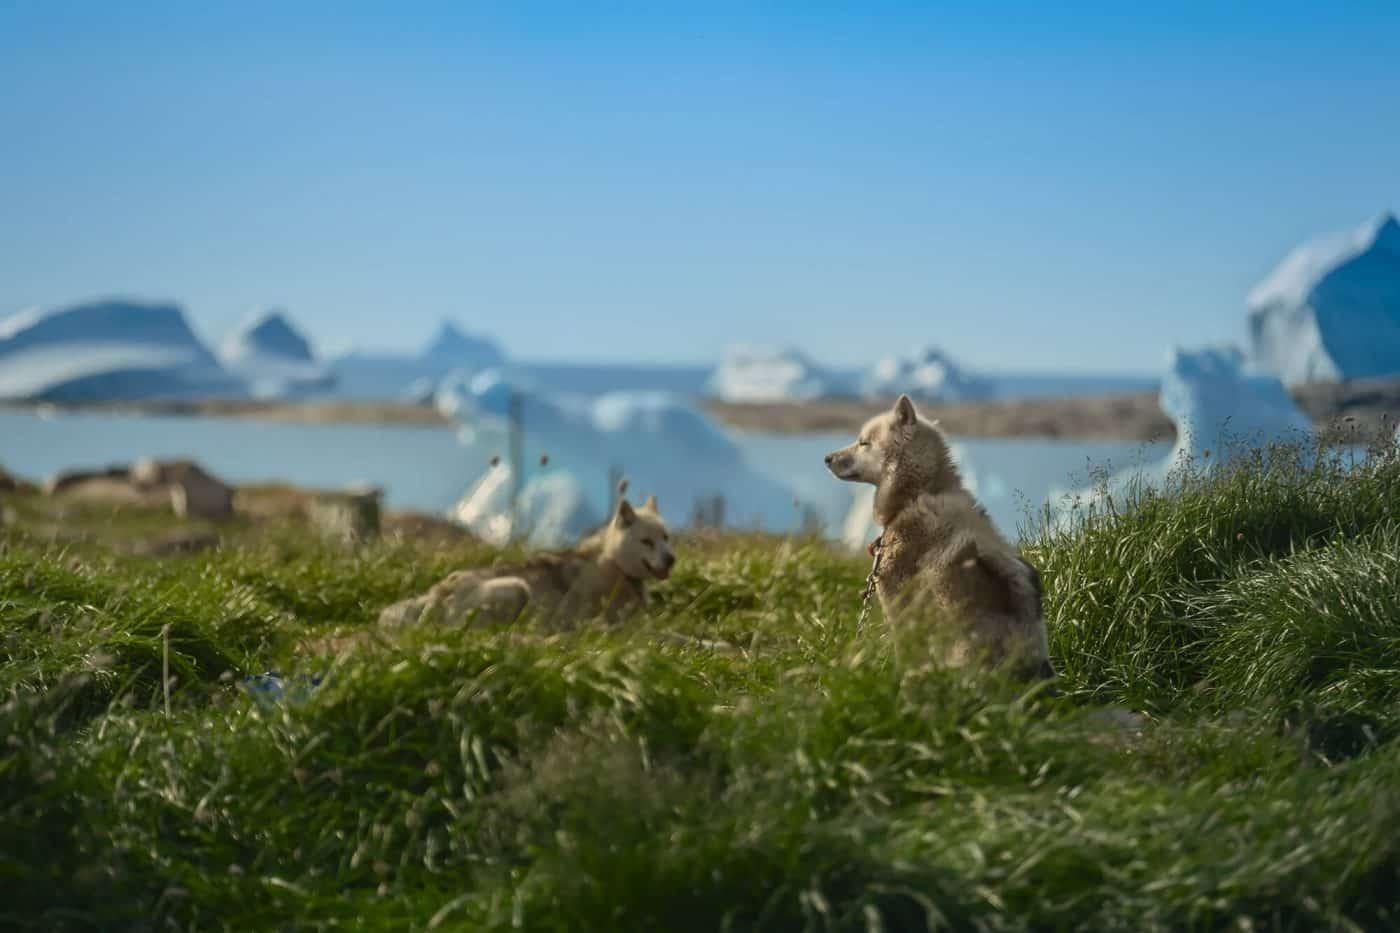 Greenland - Disko Island - Qeqertarsuaq - Greenland dog resting. Photo by Maria Sahai.